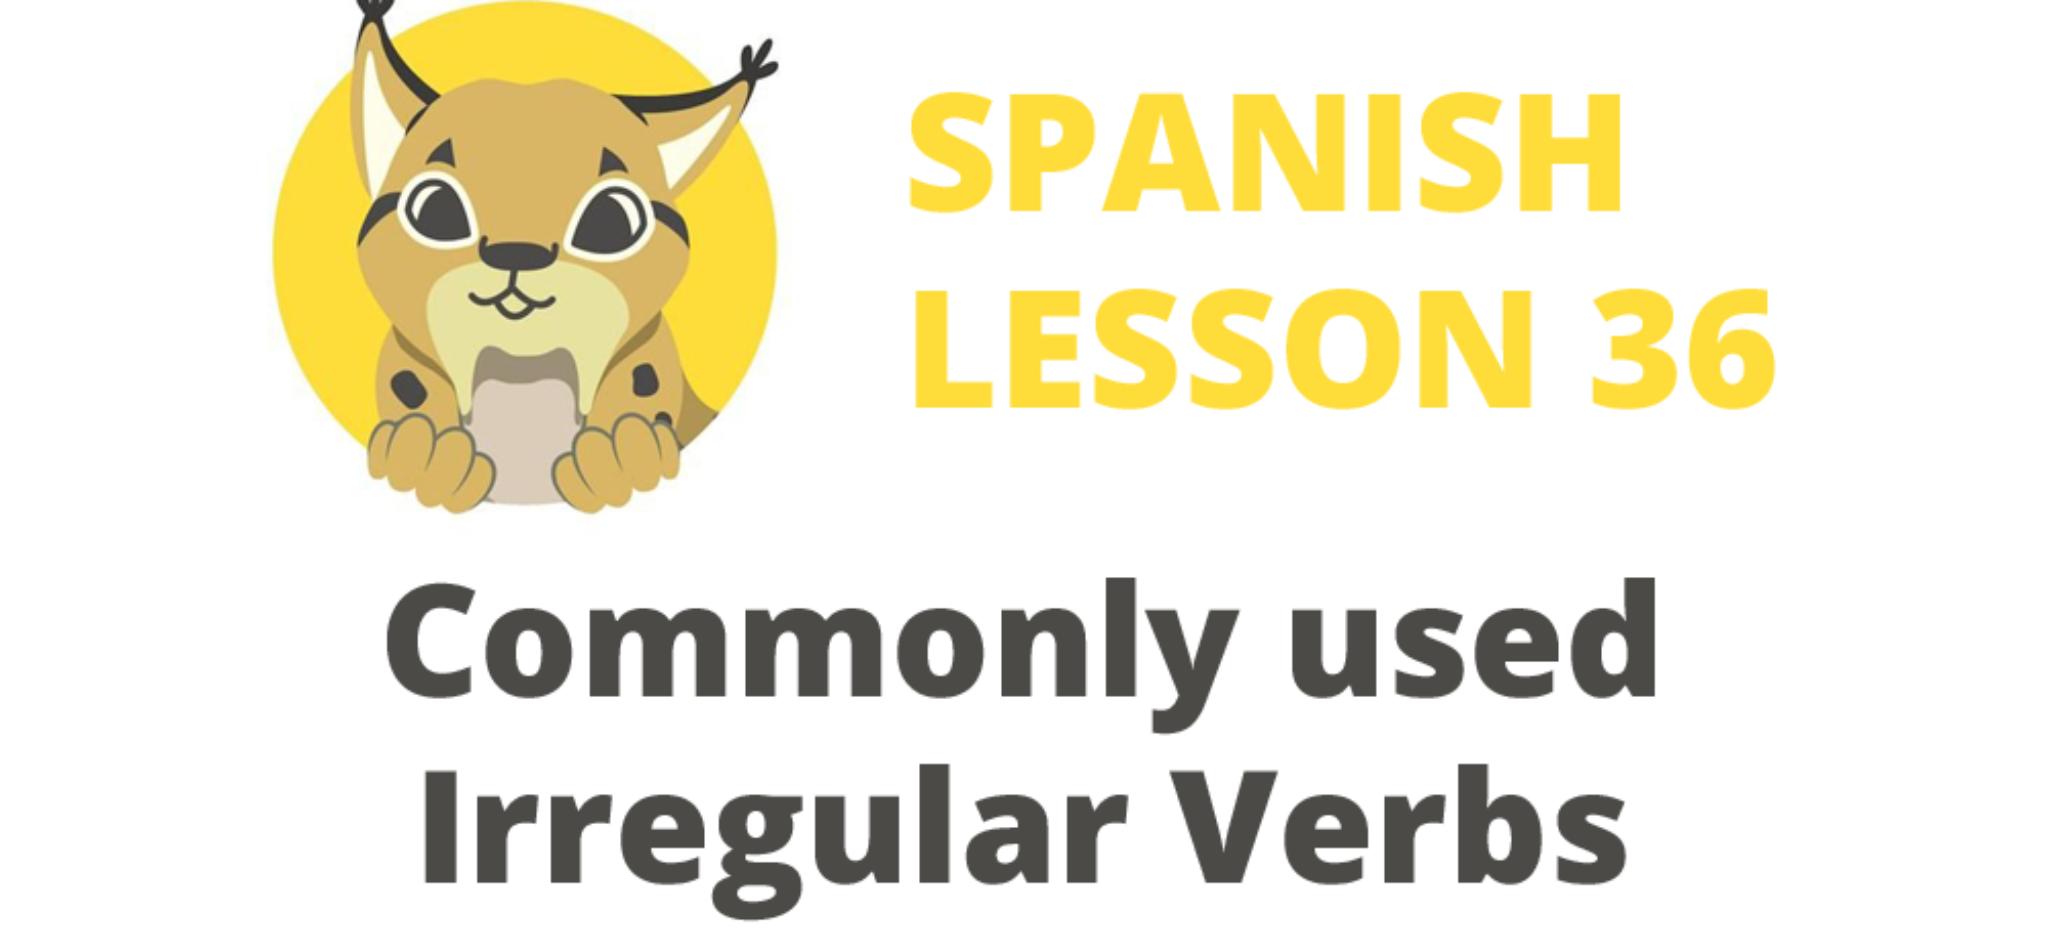 Commonly used Irregular Spanish Verbs